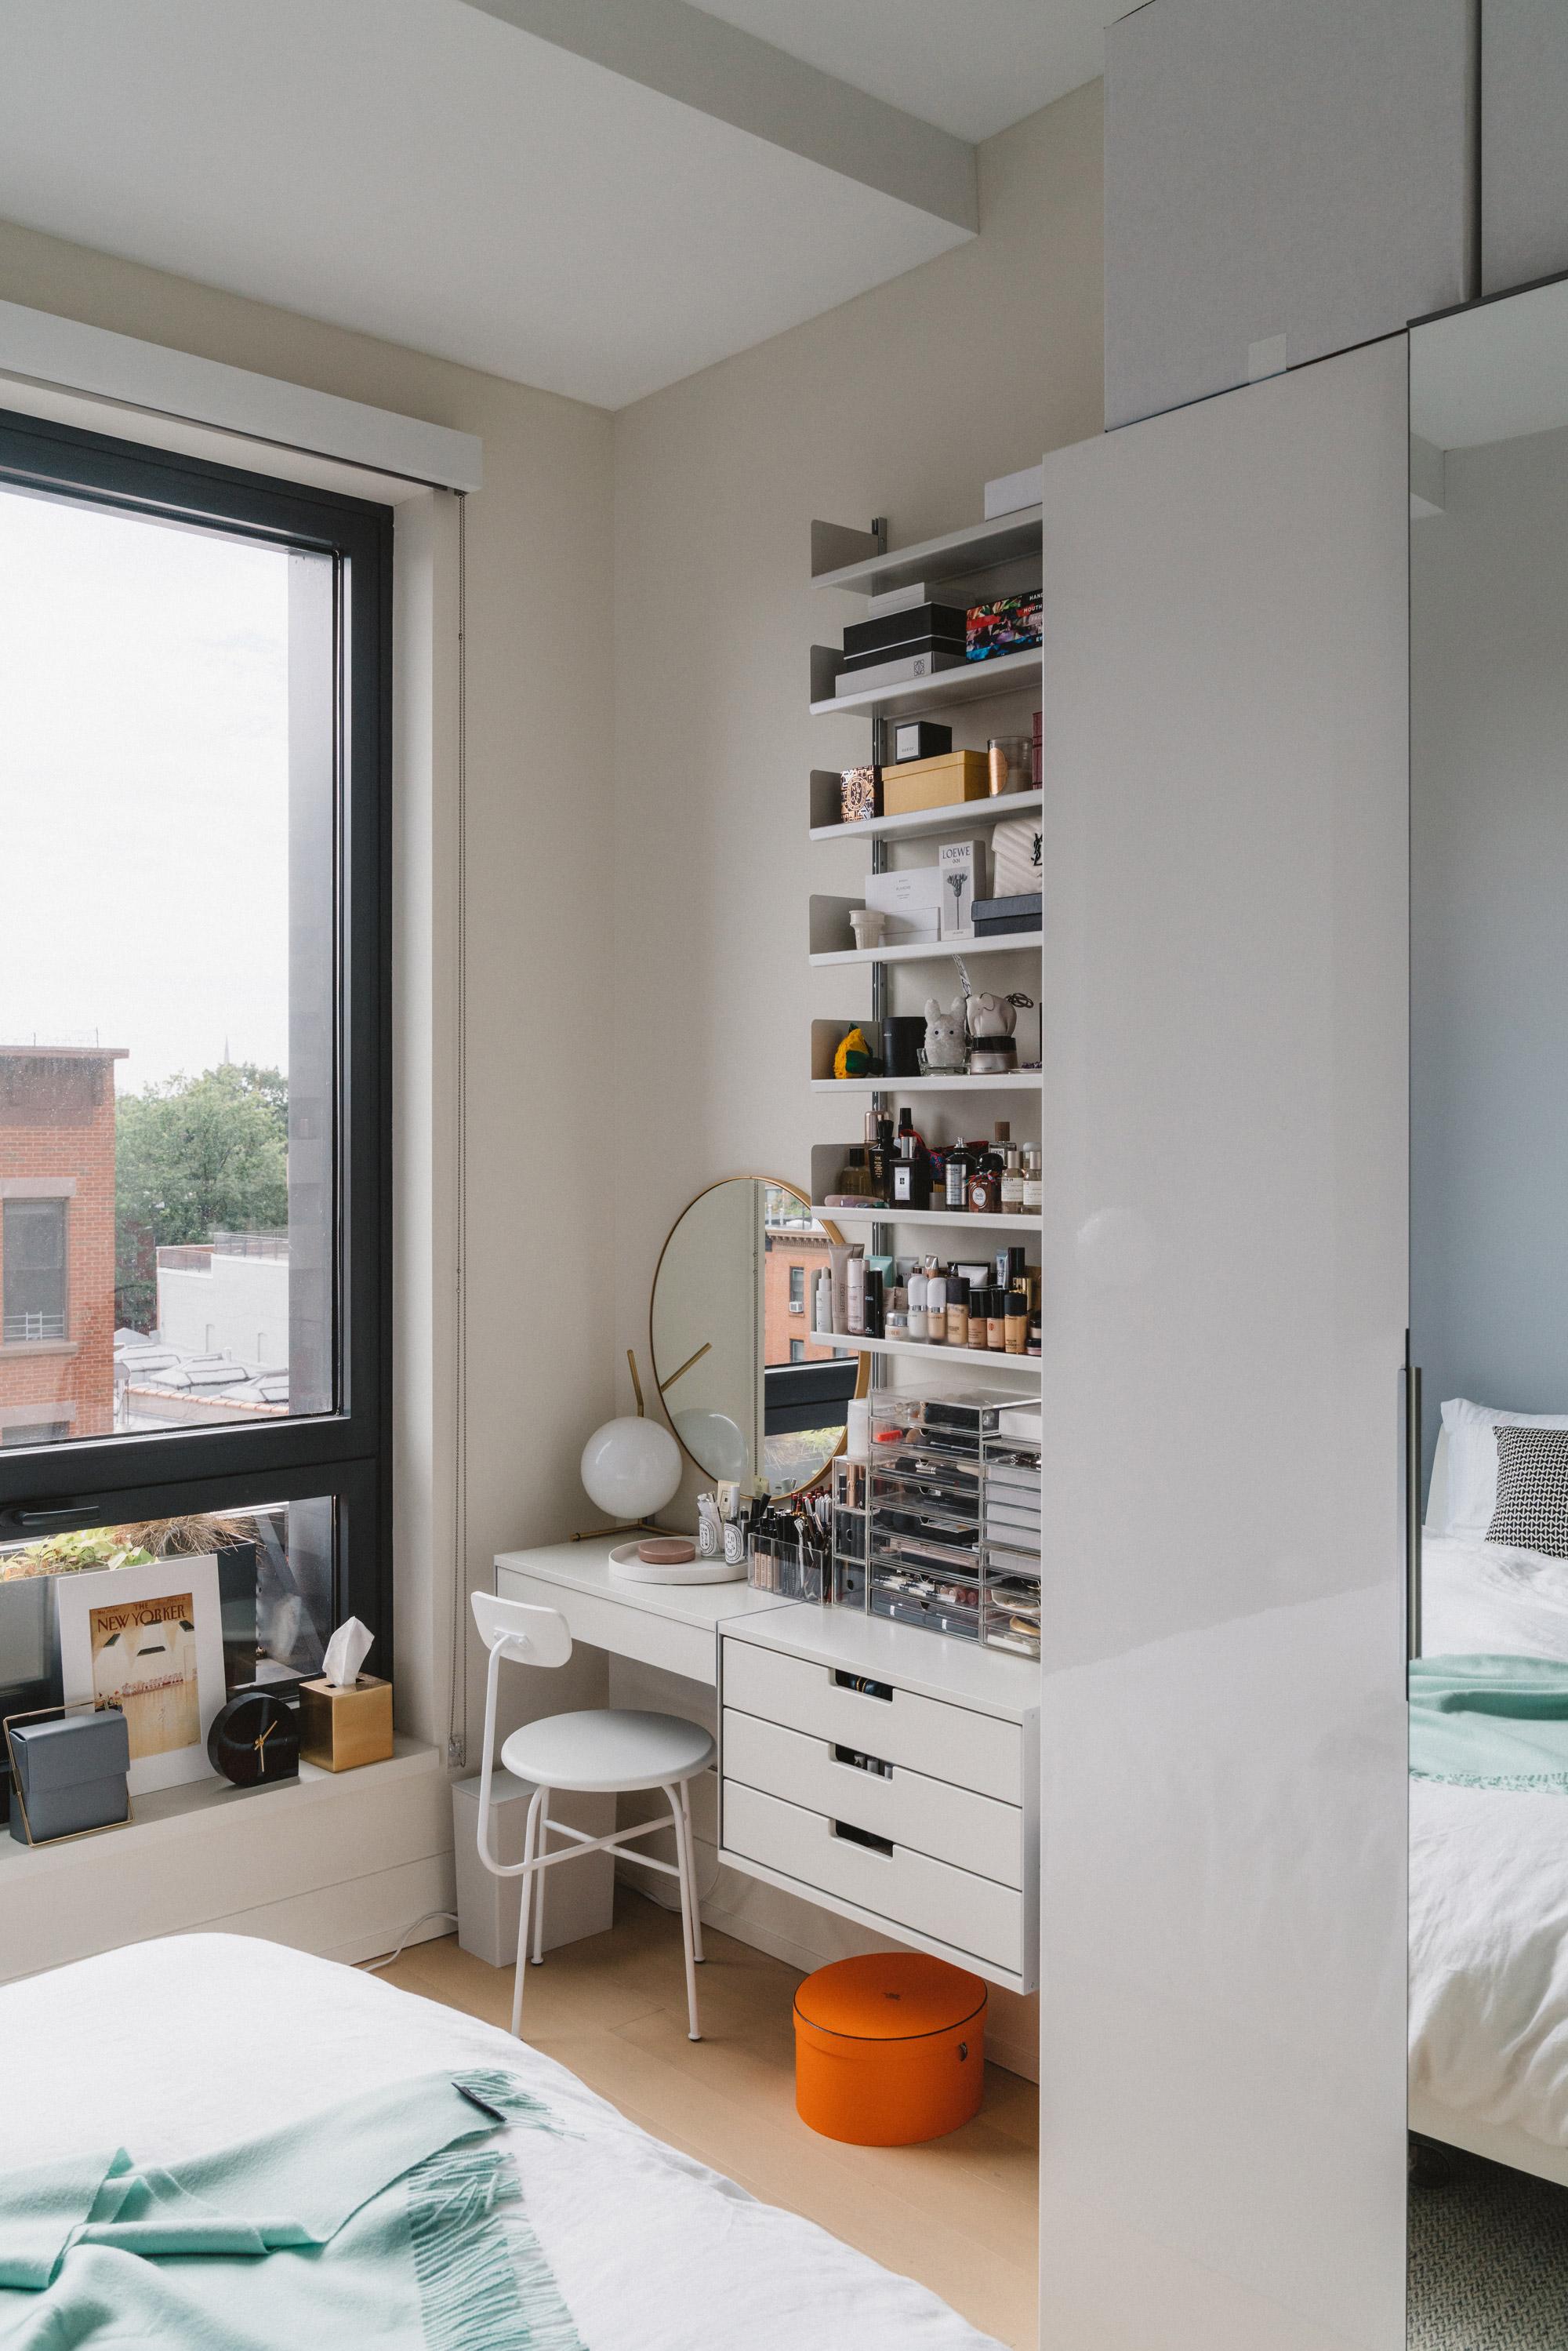 My little corner of happy (aka where I get ready every morning!)